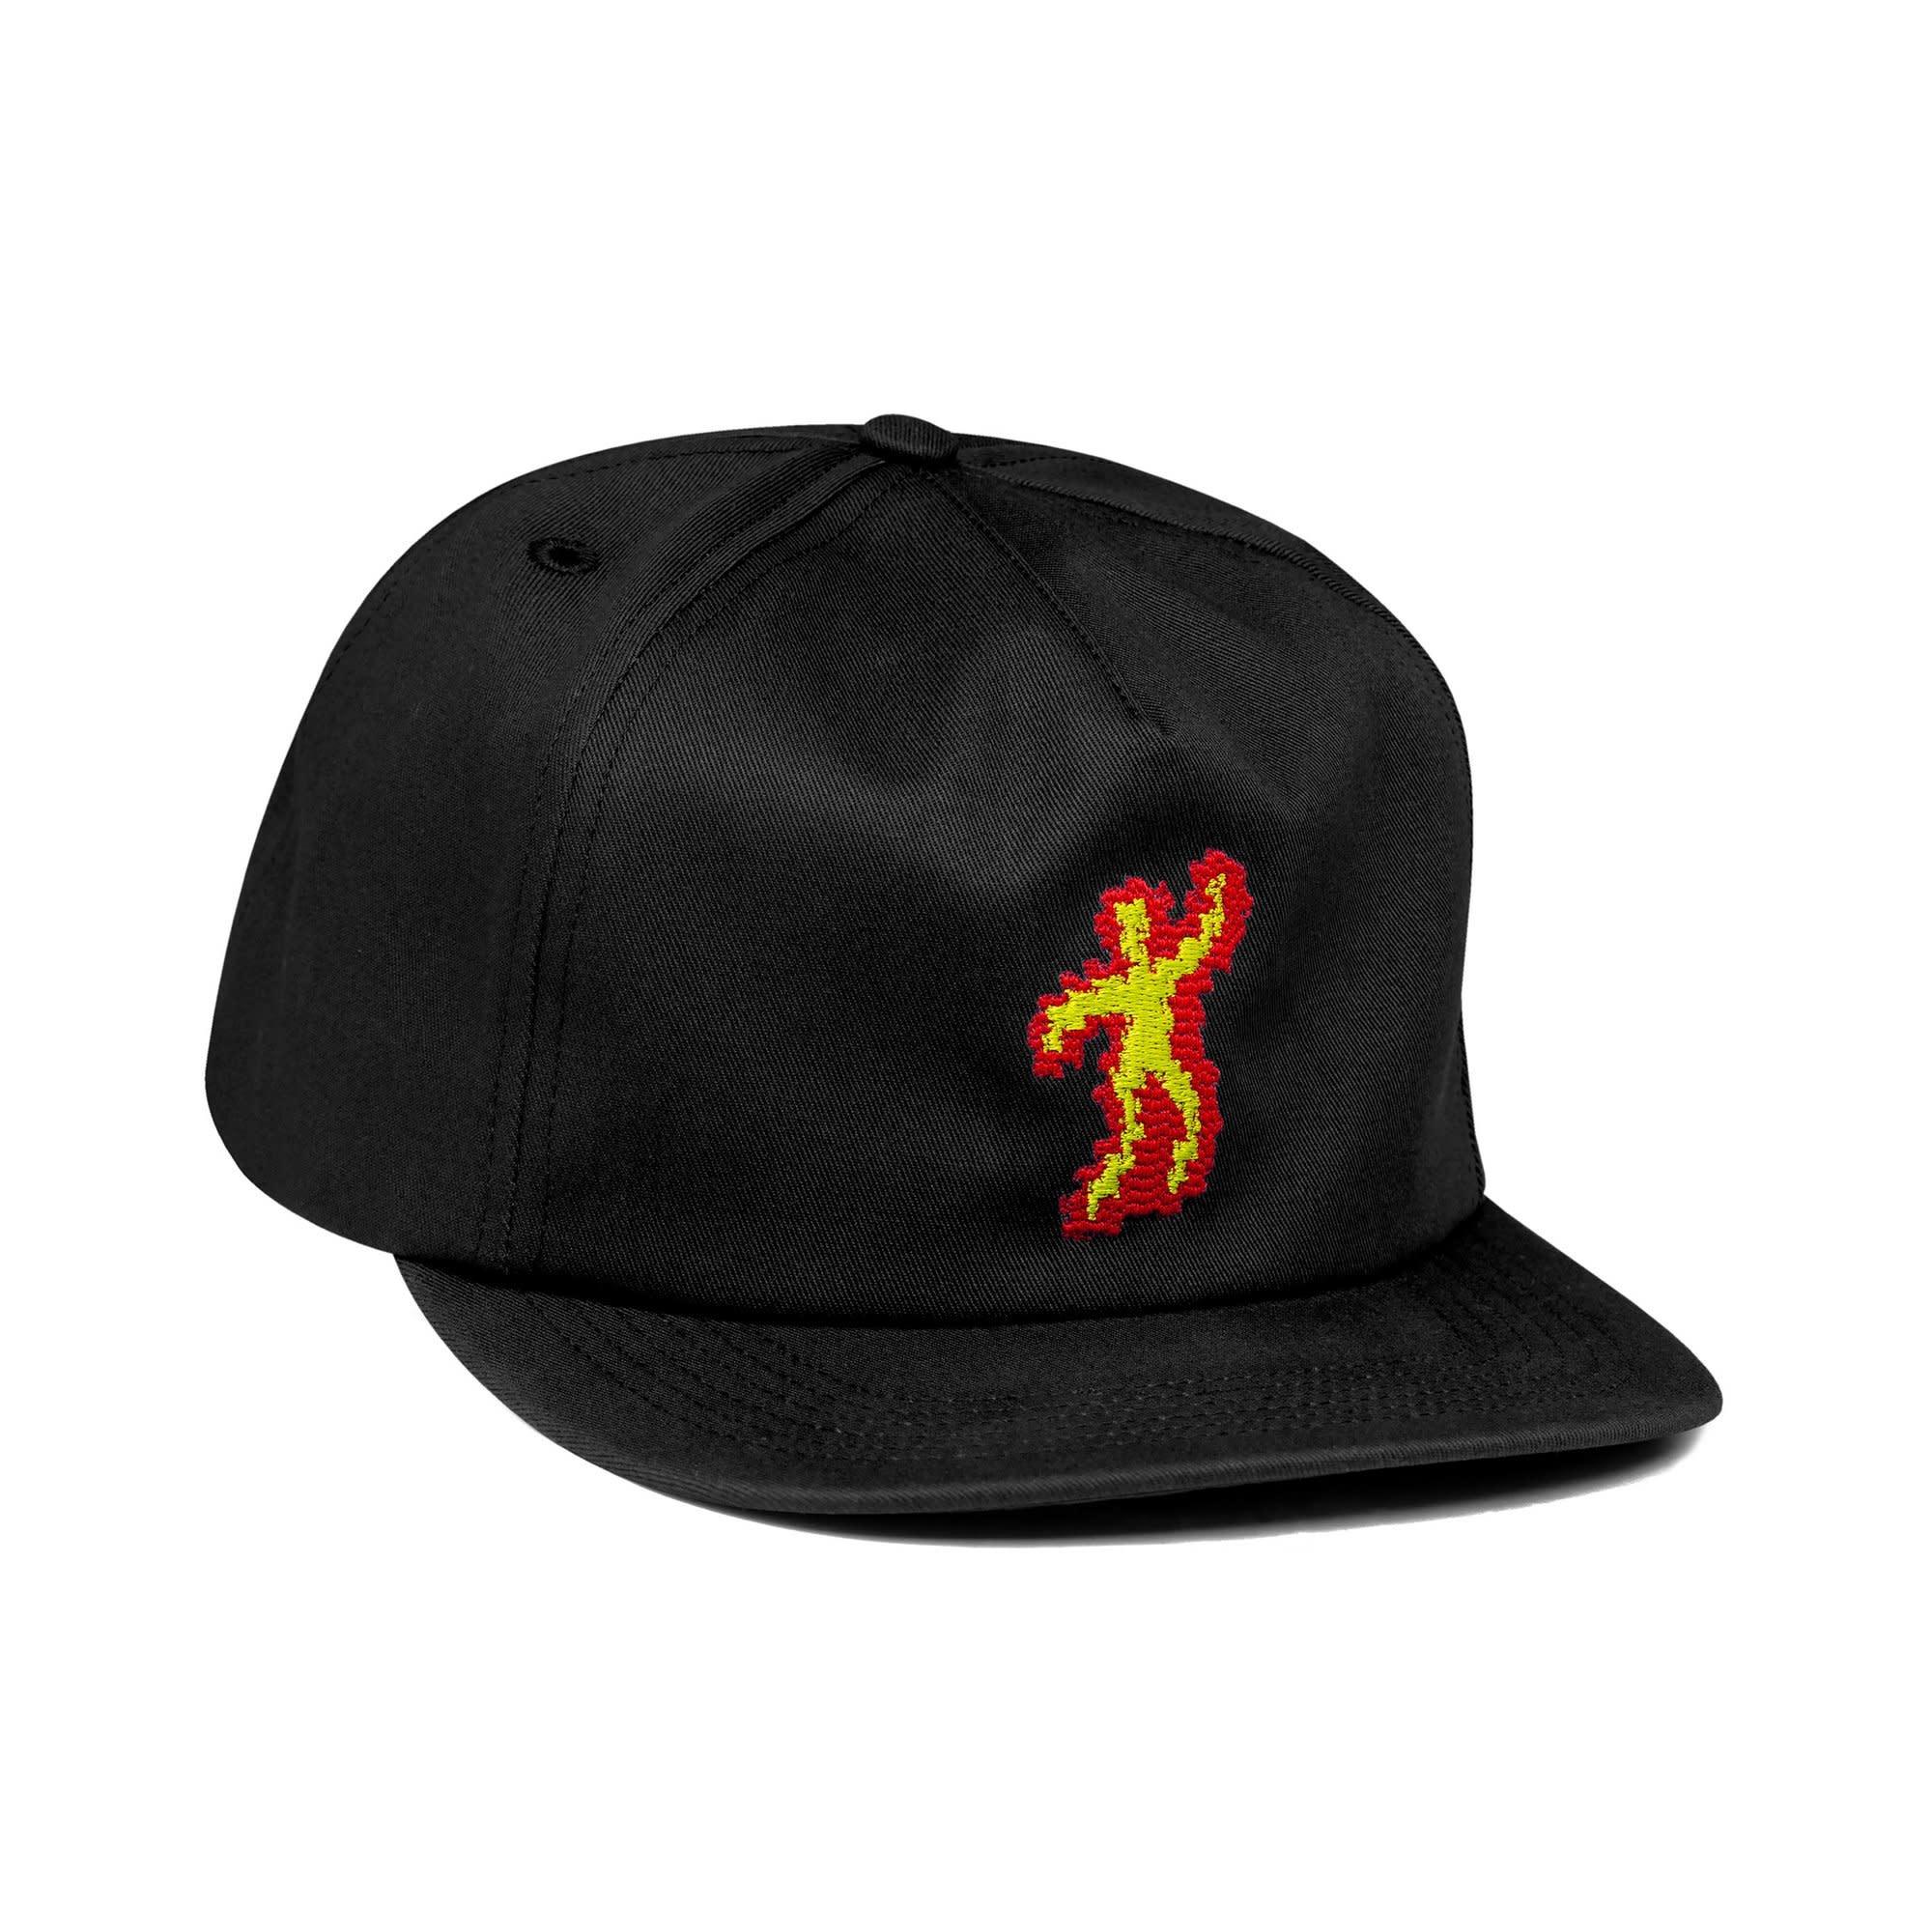 CallMe917 Scorched Hat Black